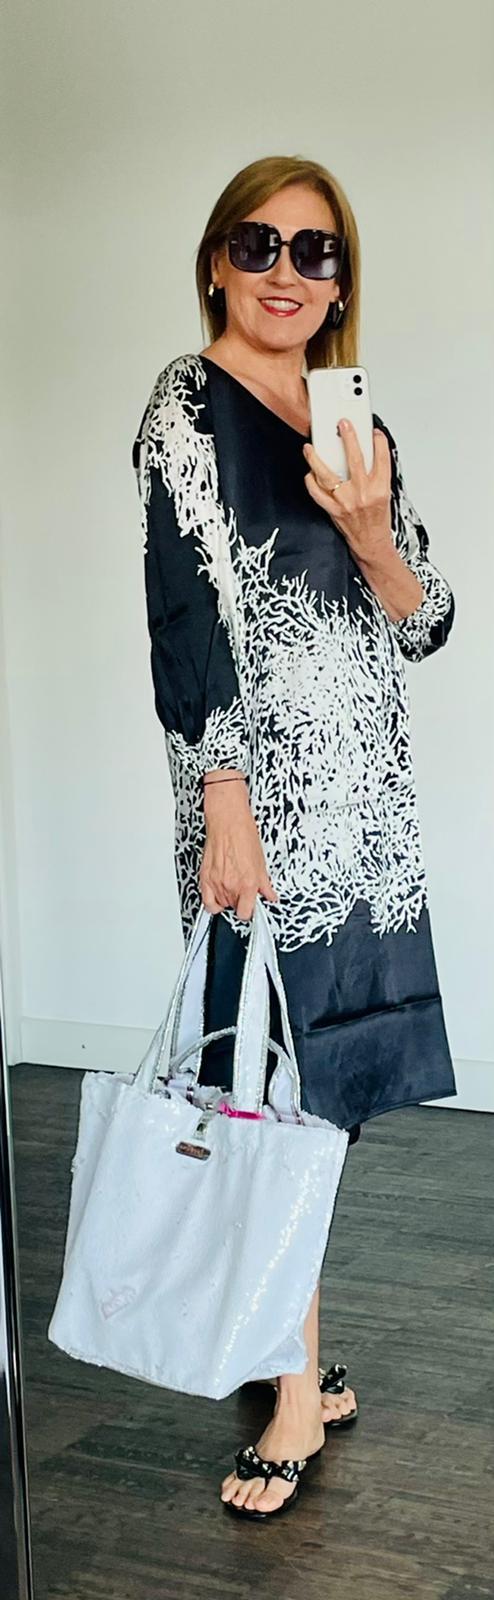 ming&dress coral schwarz/weiss